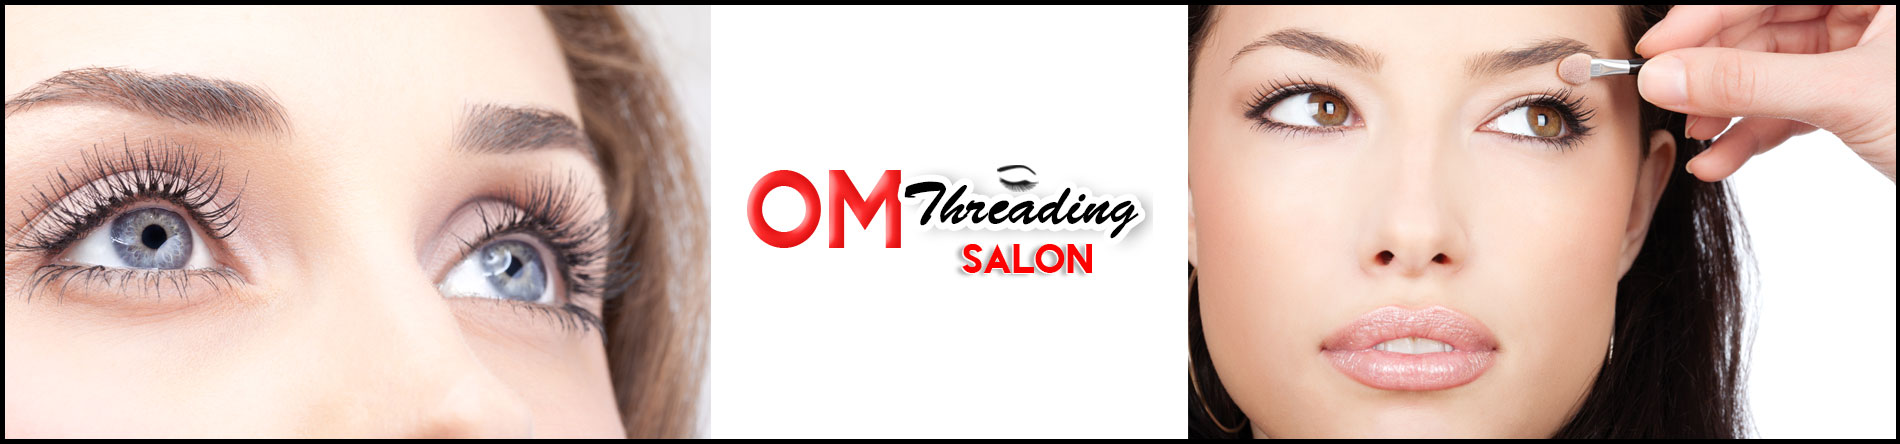 Om Threading Salon is a Threading Salon in Seattle, WA